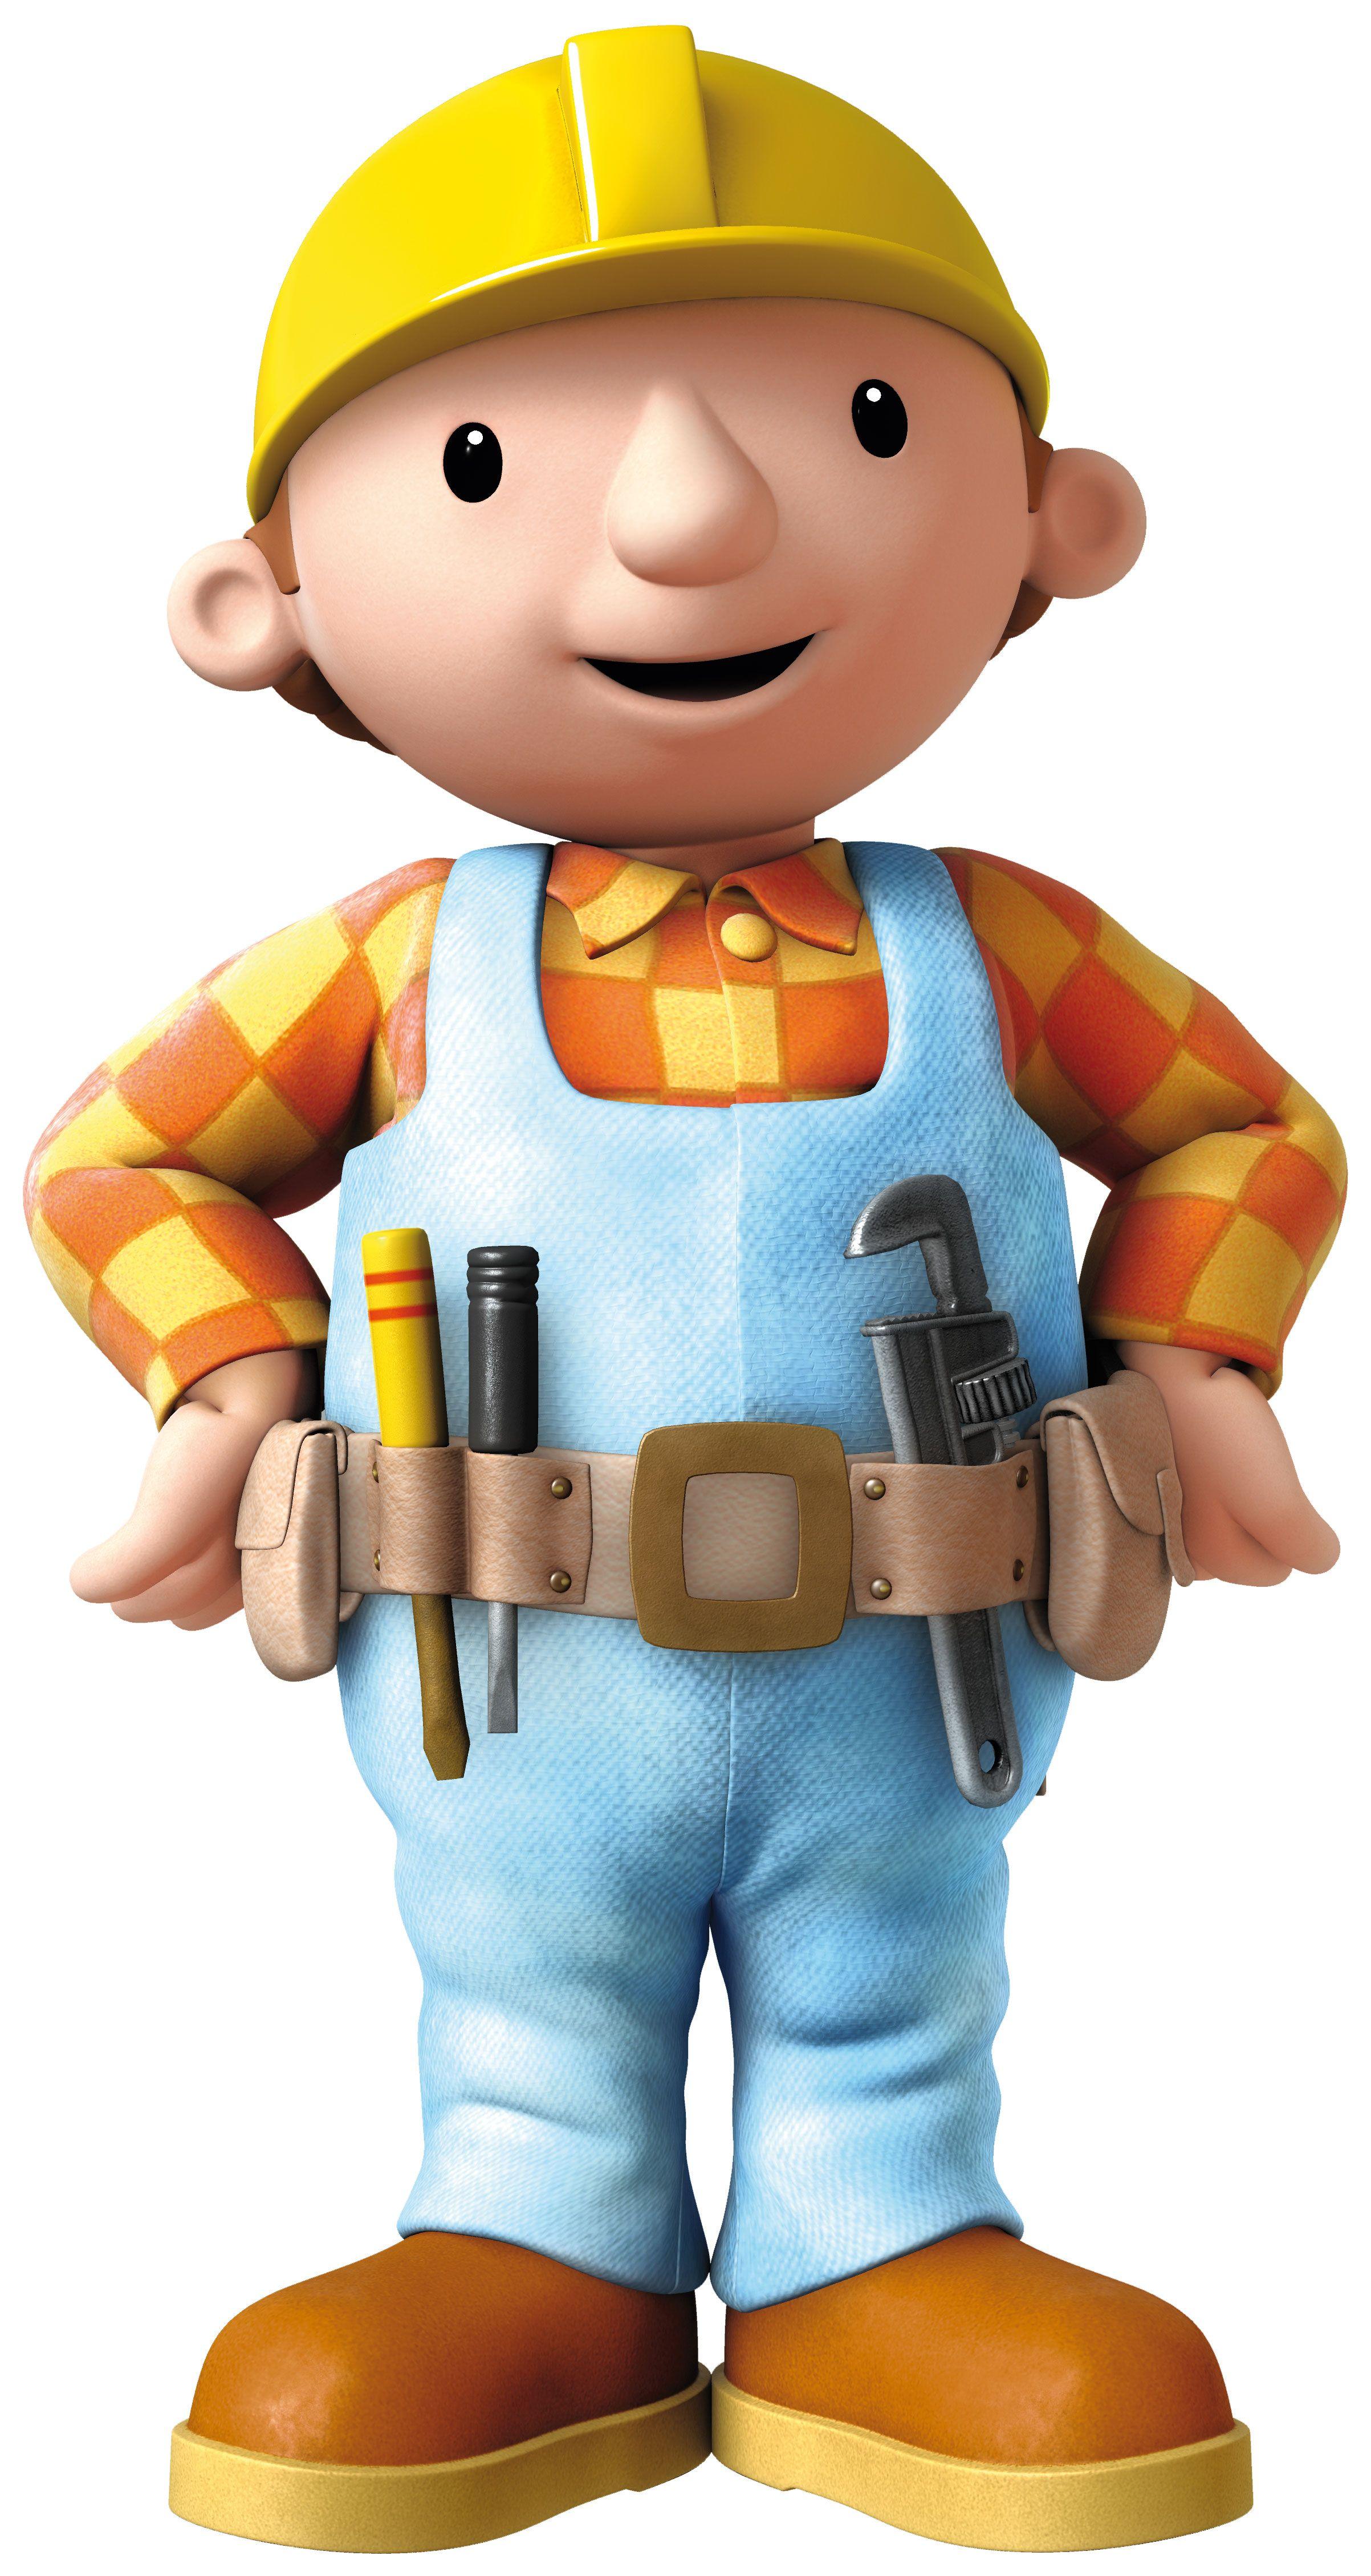 bob the builder google search bob the builder printables in 2018